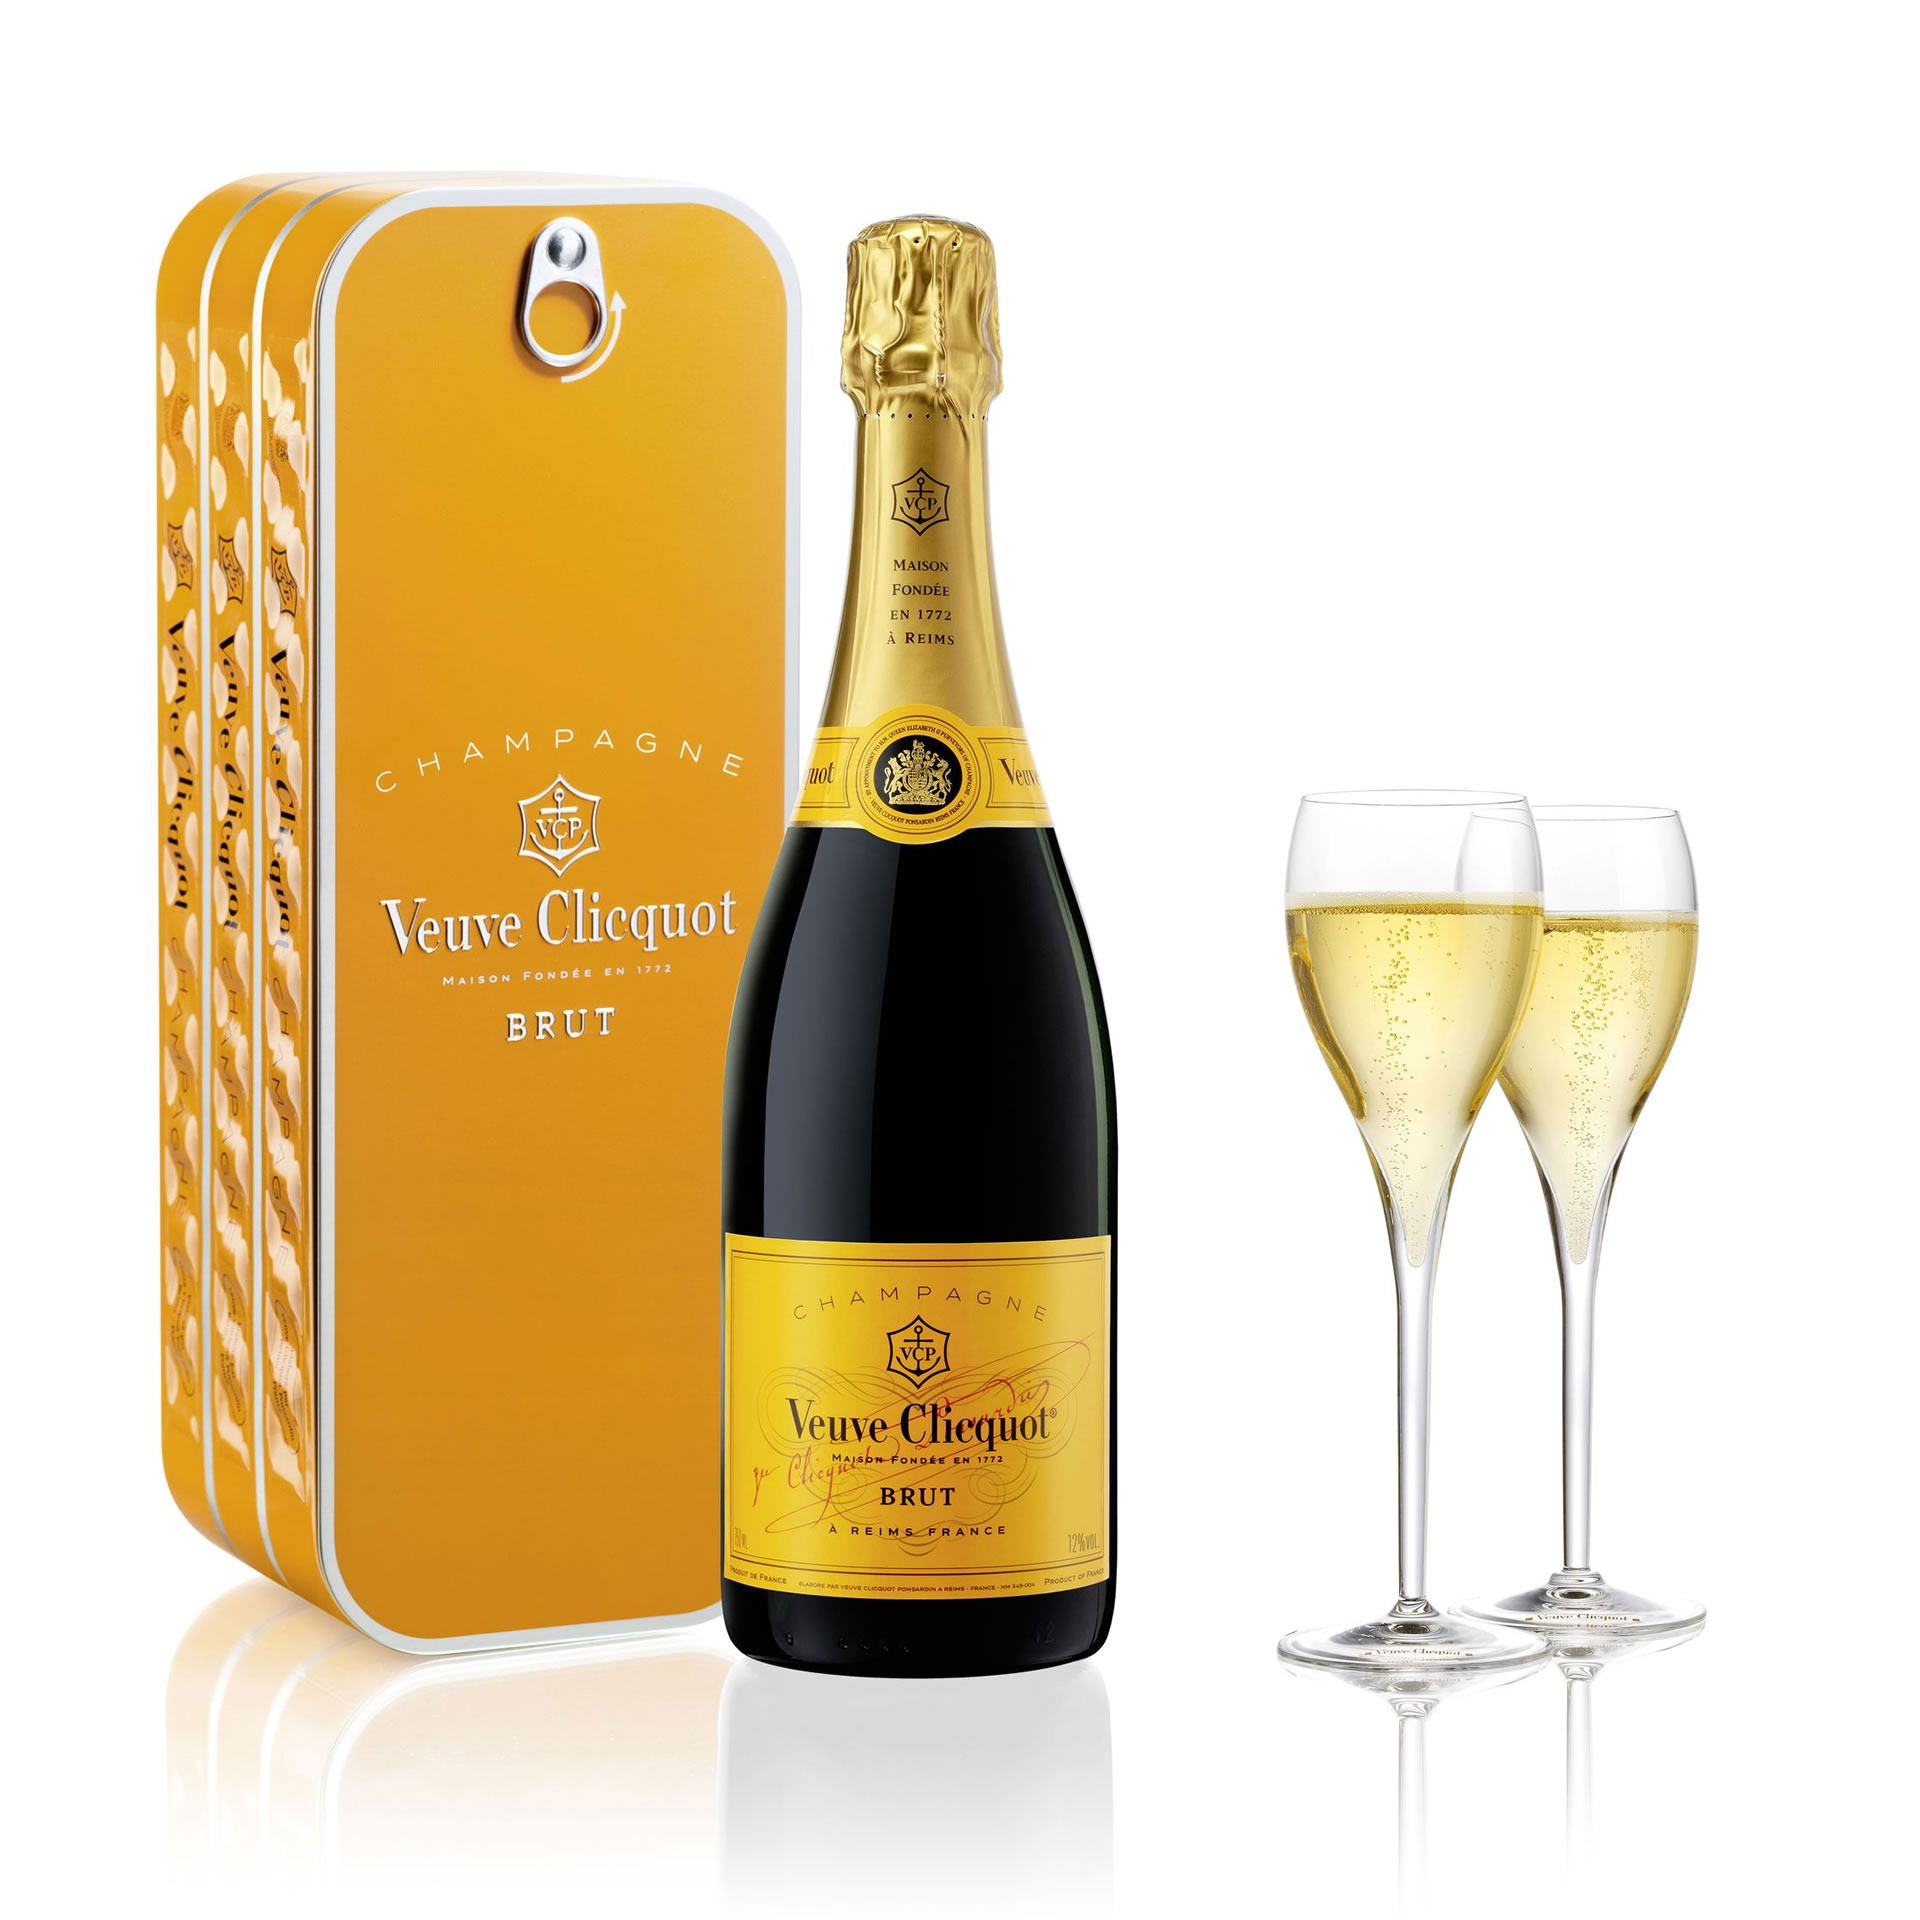 Champagne Veuve-Clicquot-Ponsardine